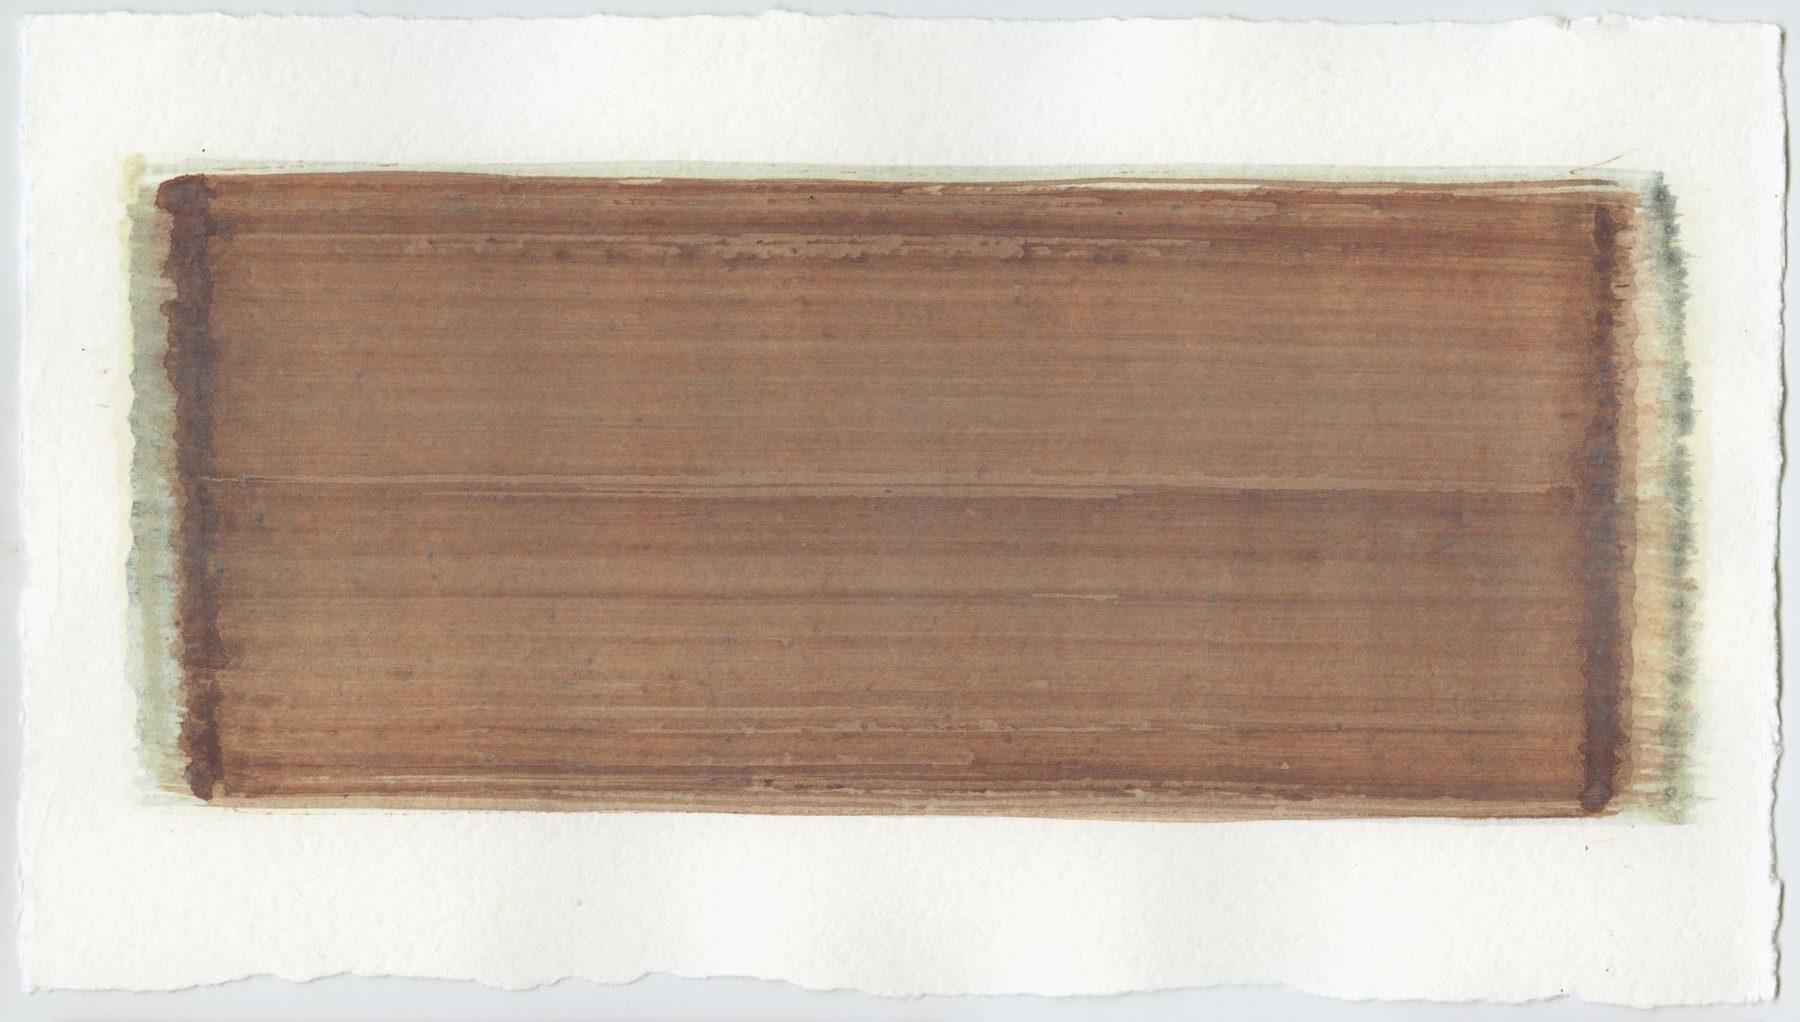 Brush stroke no. 76 - SOLD - Pigment: Vivianiet (from Kremer Pigmente) Selfmade pigment: Mortelse oker gebrand, Slabroek grijs